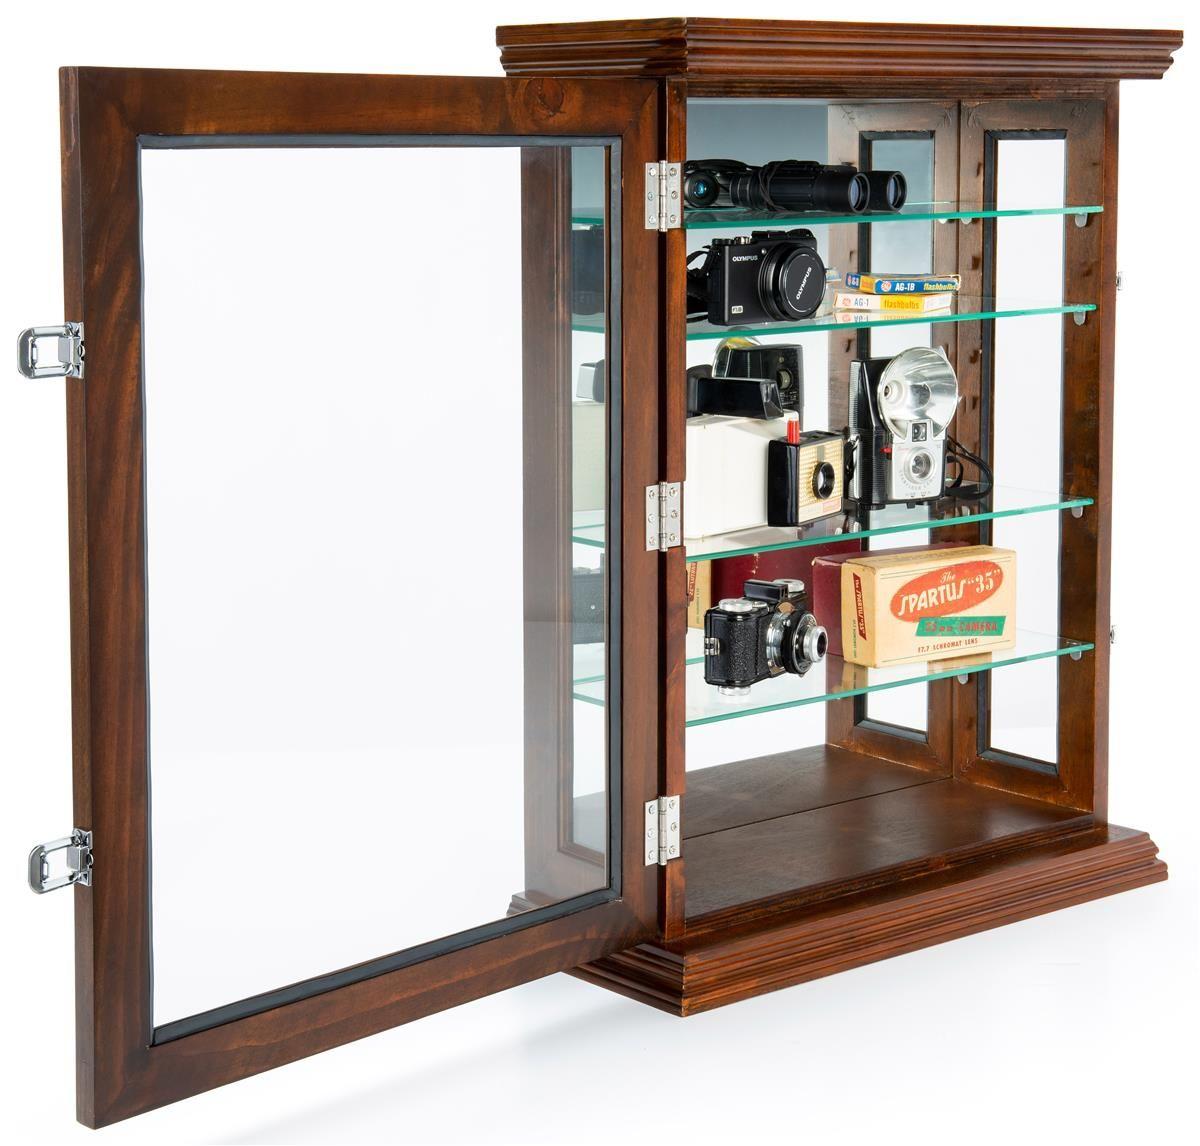 Wall Or Counter Curio Cabinet Mirror Back Adjustable Shelves Locking Dark Cherry In 2020 Adjustable Shelving Wall Curio Cabinet Tempered Glass Shelves